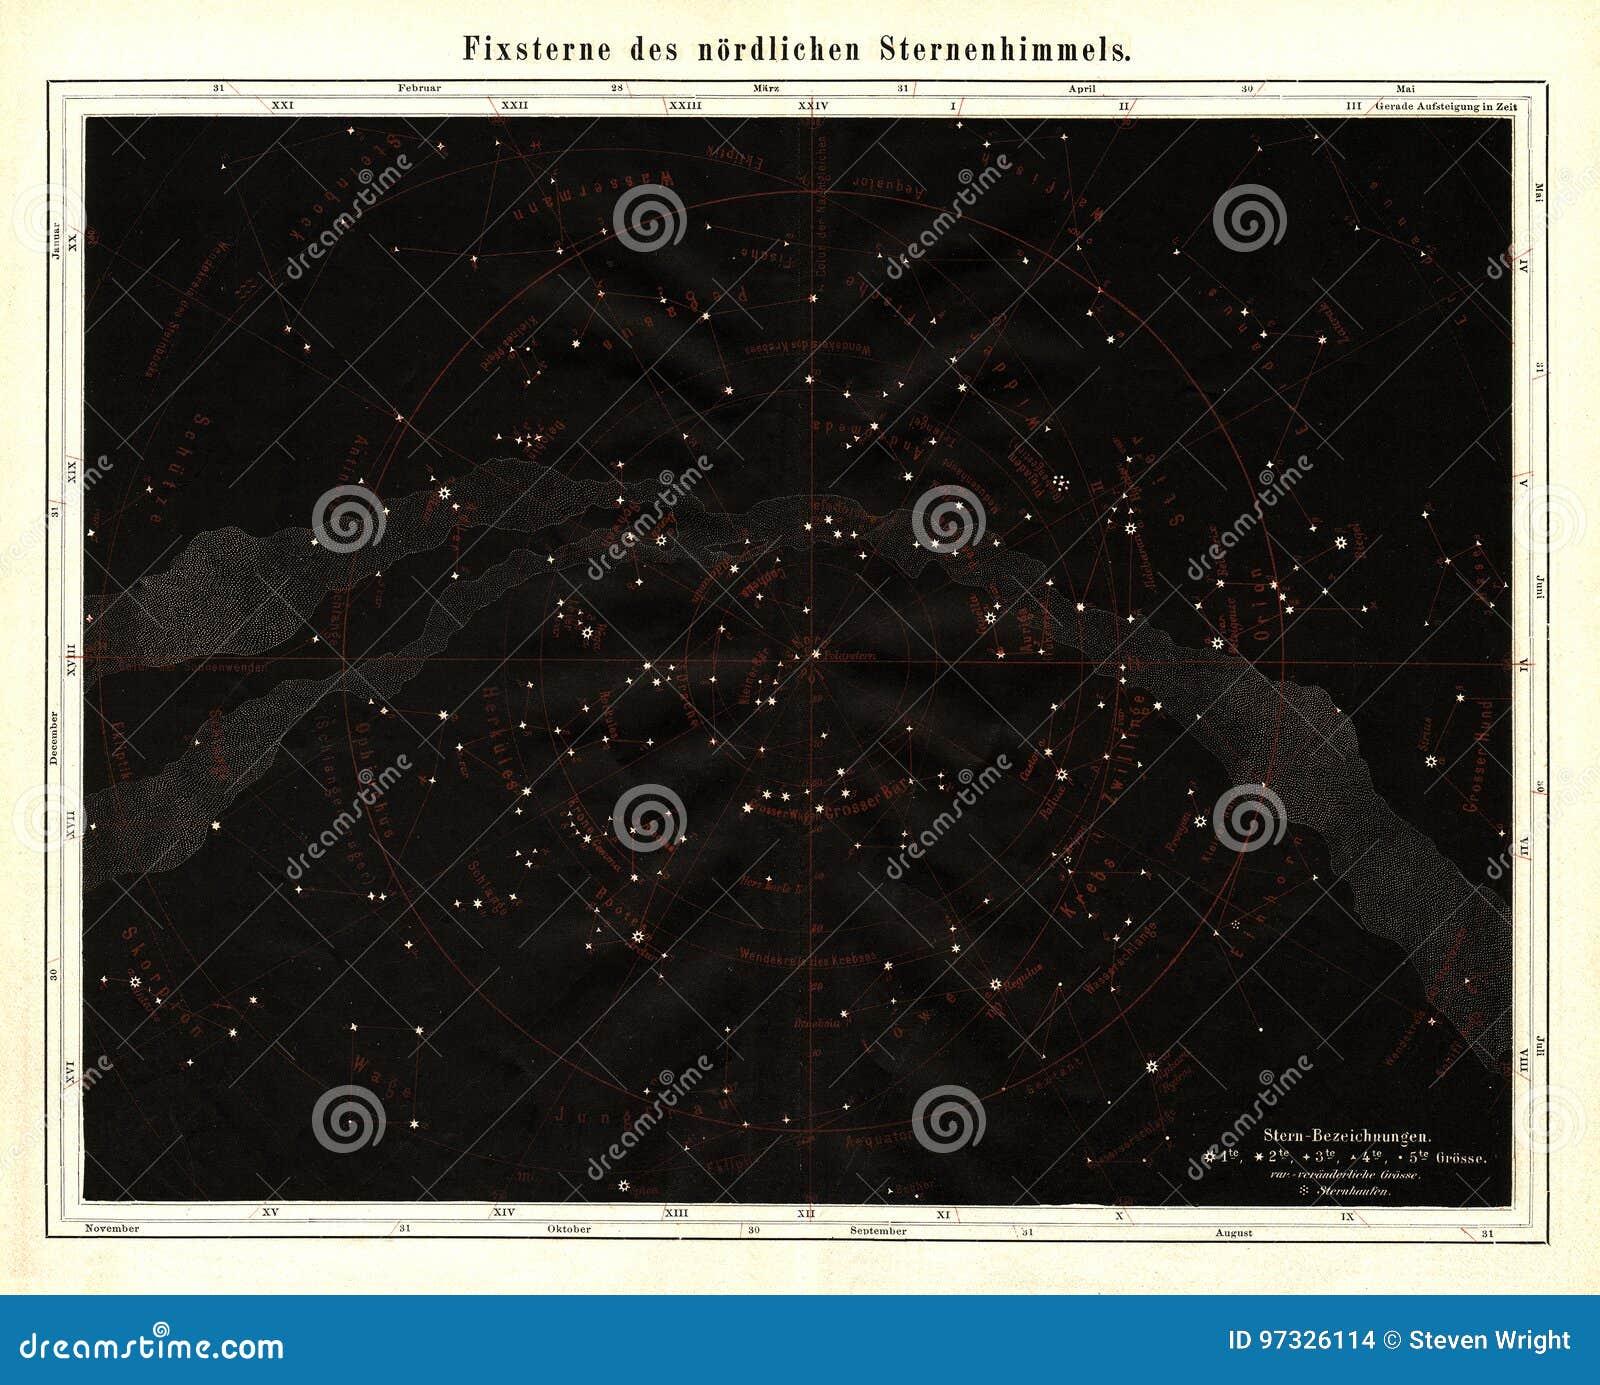 Meyer Antique Astronomy Star Map 1875 du ciel du nord